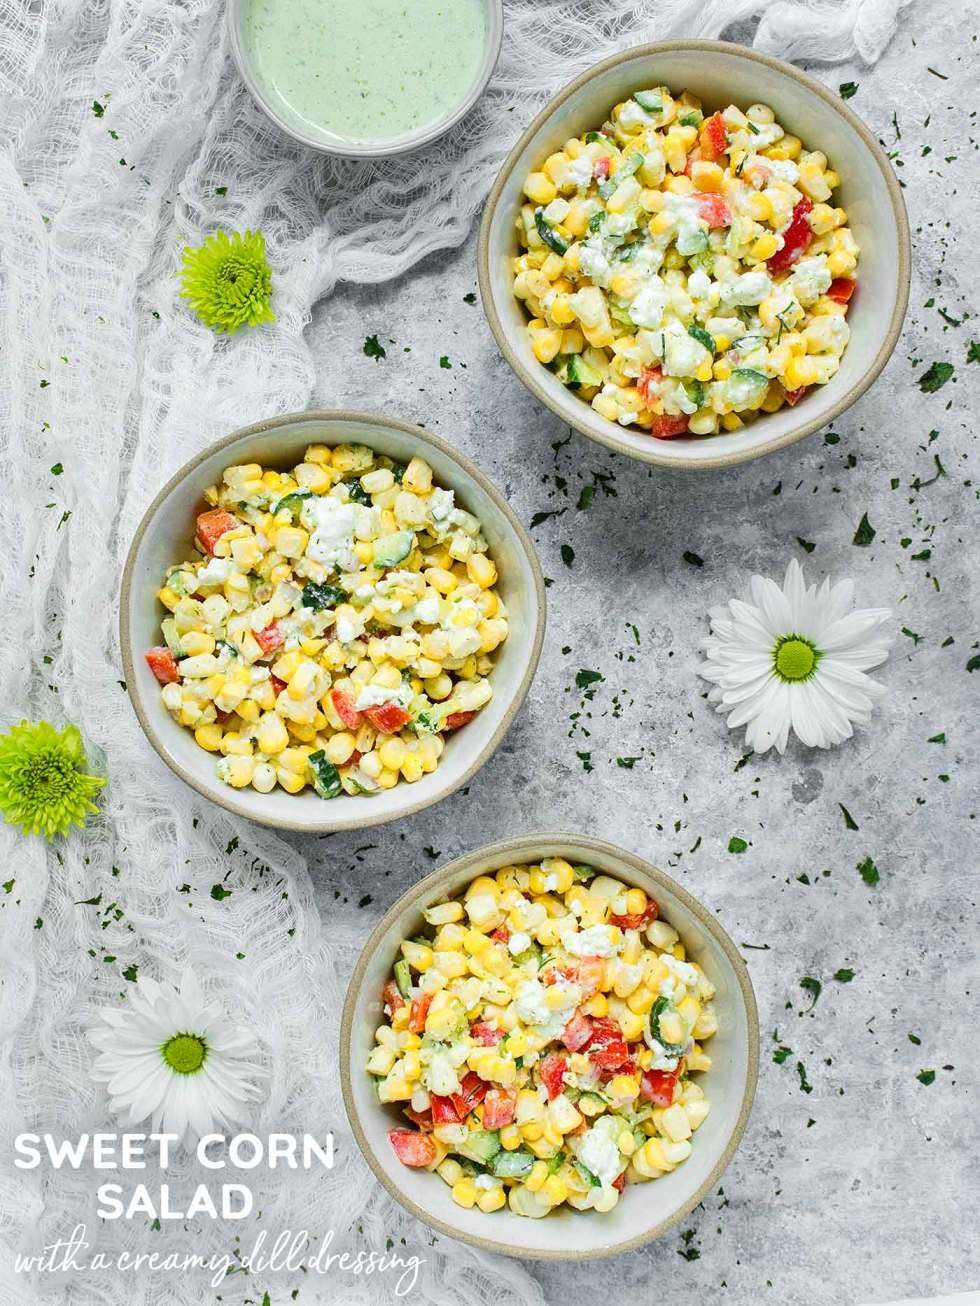 Sweet Corn Salad with Creamy Dill Dressing - Recipe at SoupAddict.com